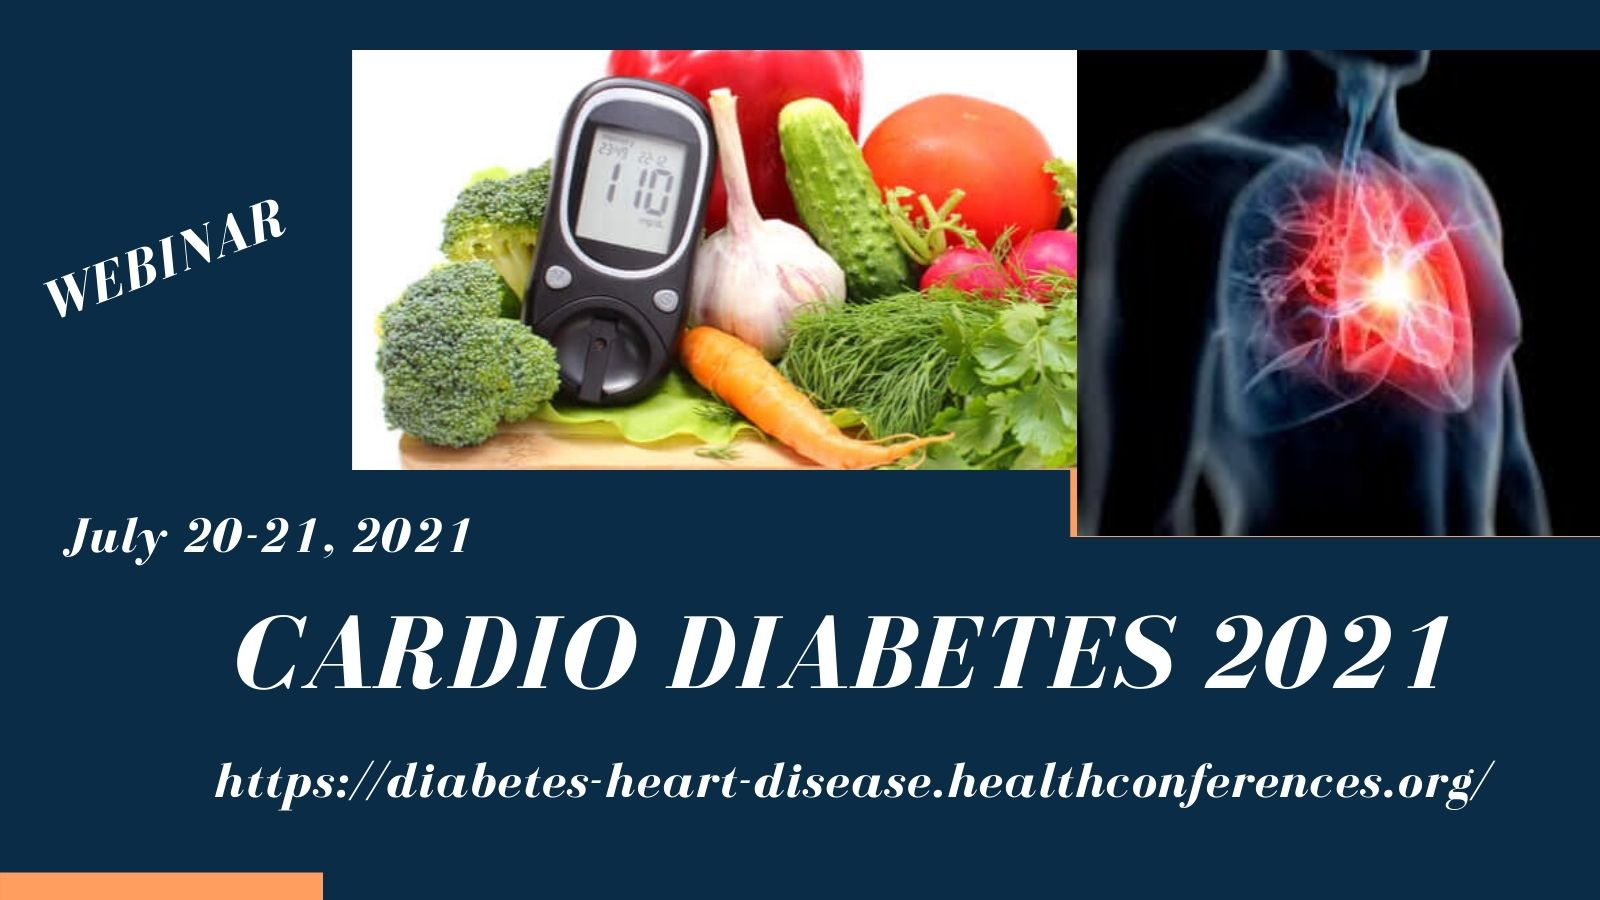 - CARDIO DIABETES 2021